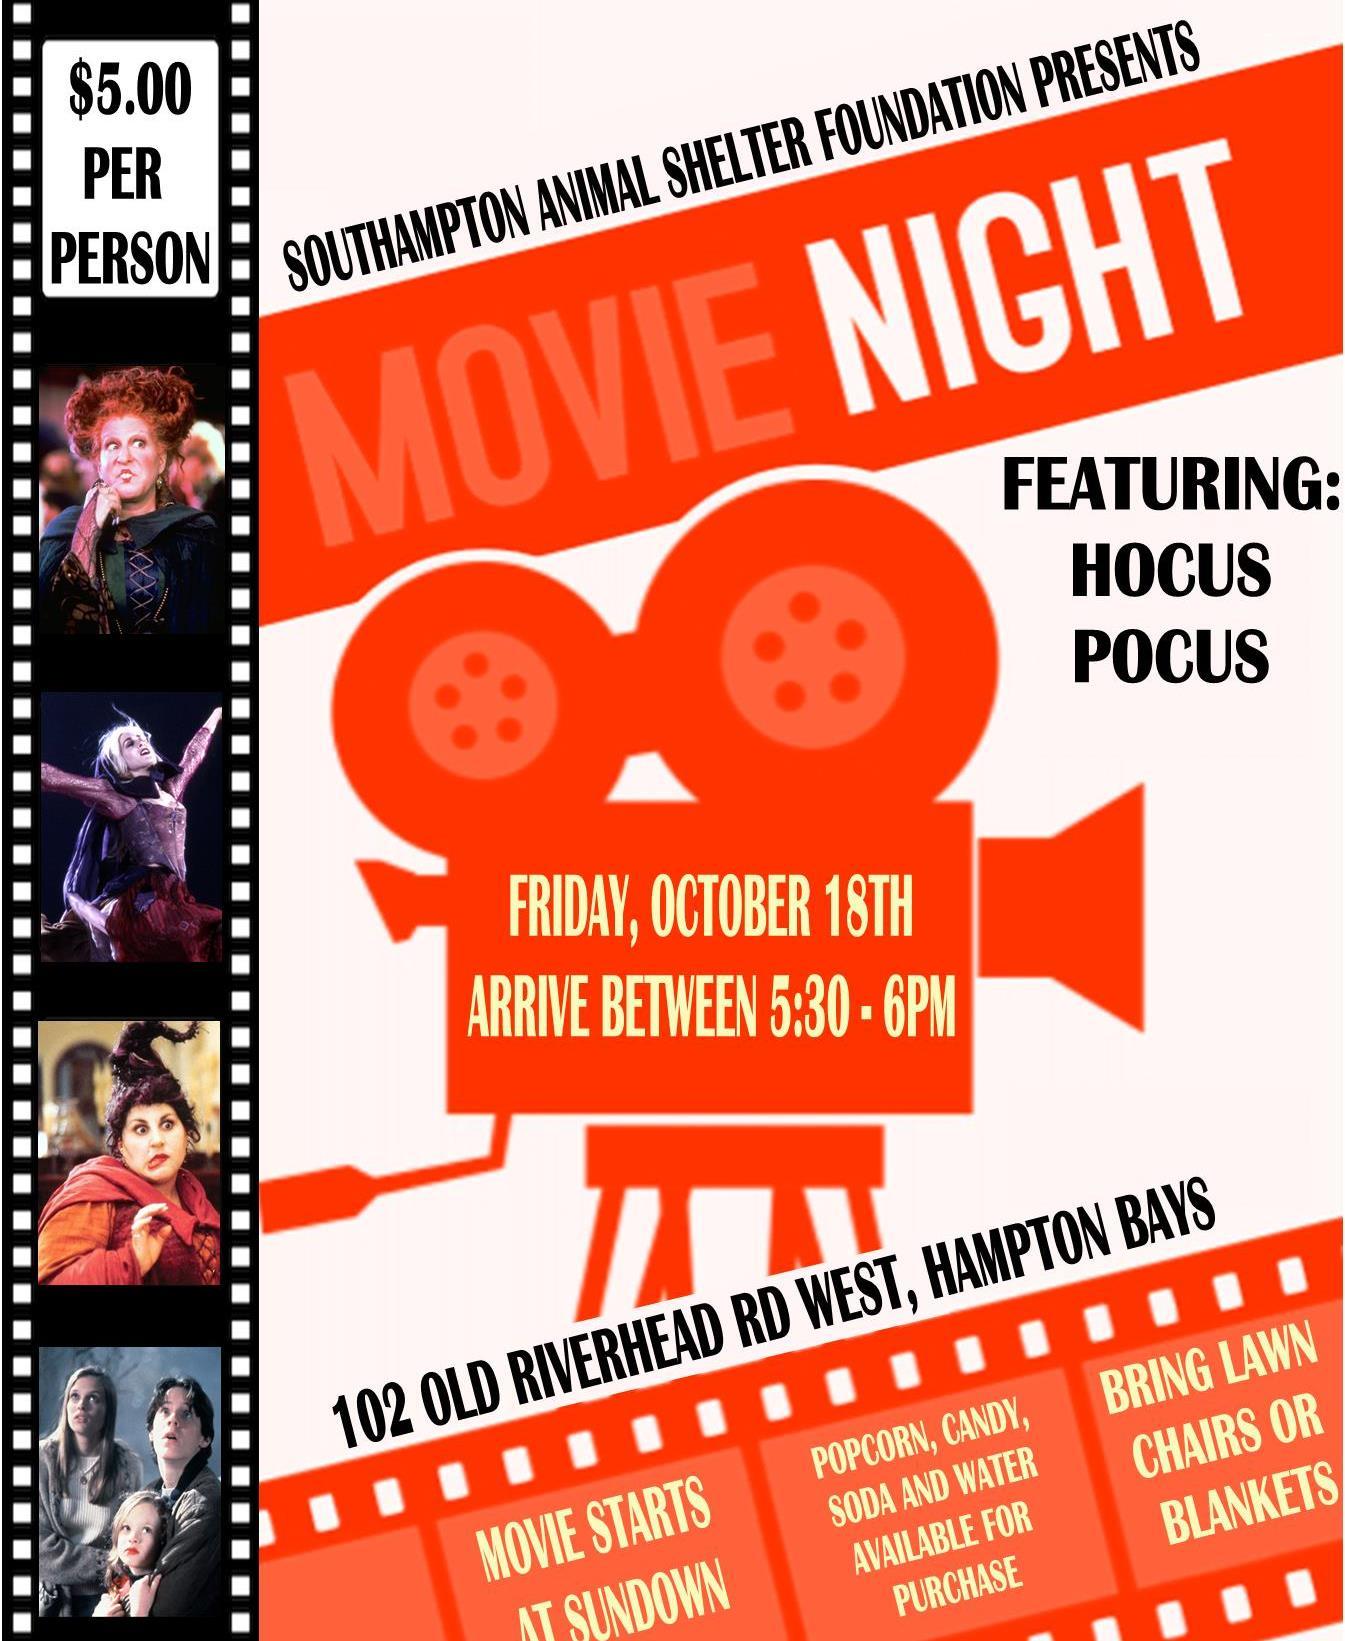 Movies for Mutts - Hocus Pocus